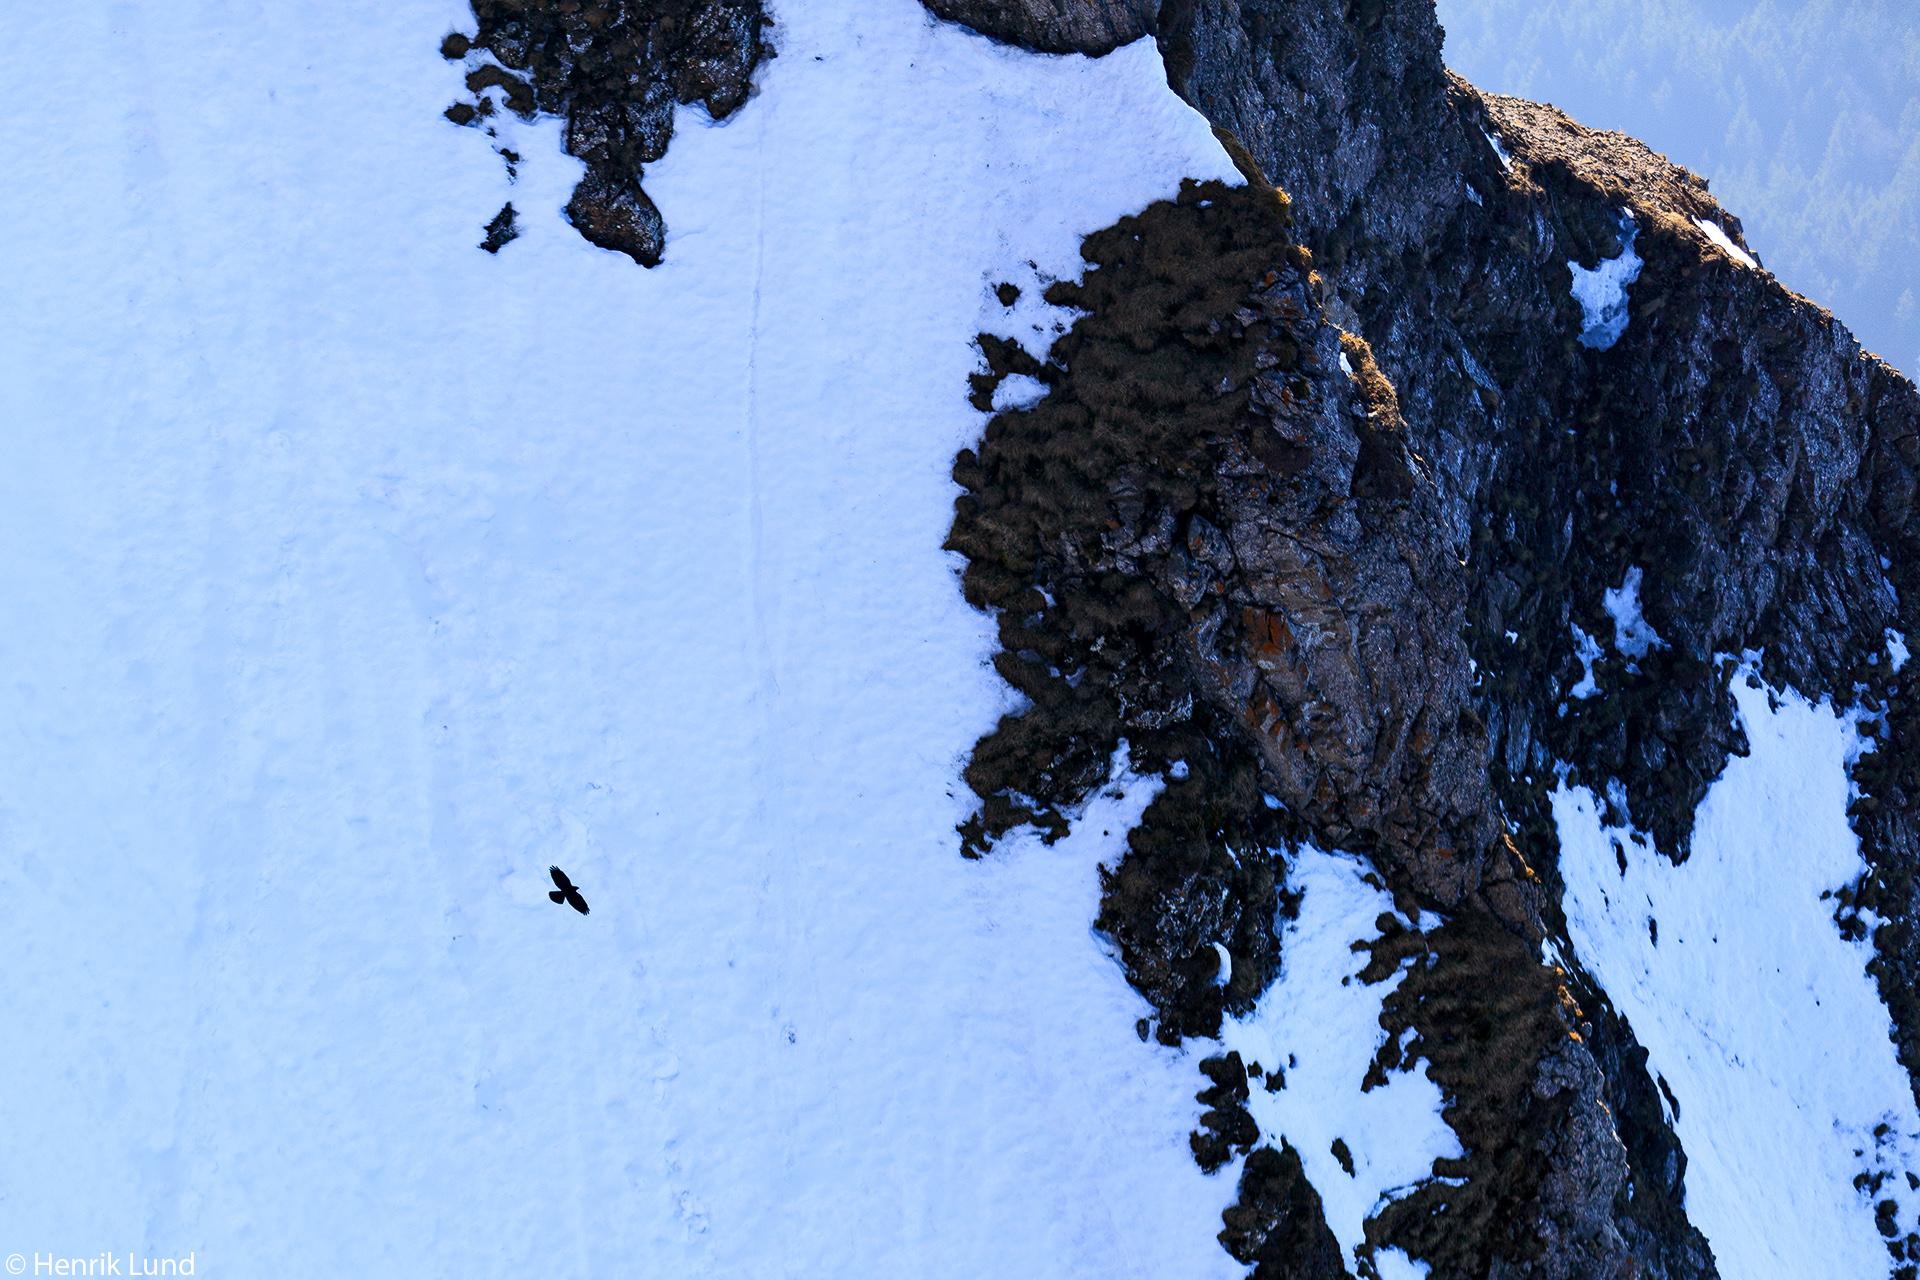 Alpine chough in flight over the steep cliff walls on mount Pilatus, Lucerne in Switzerland. April 2018.